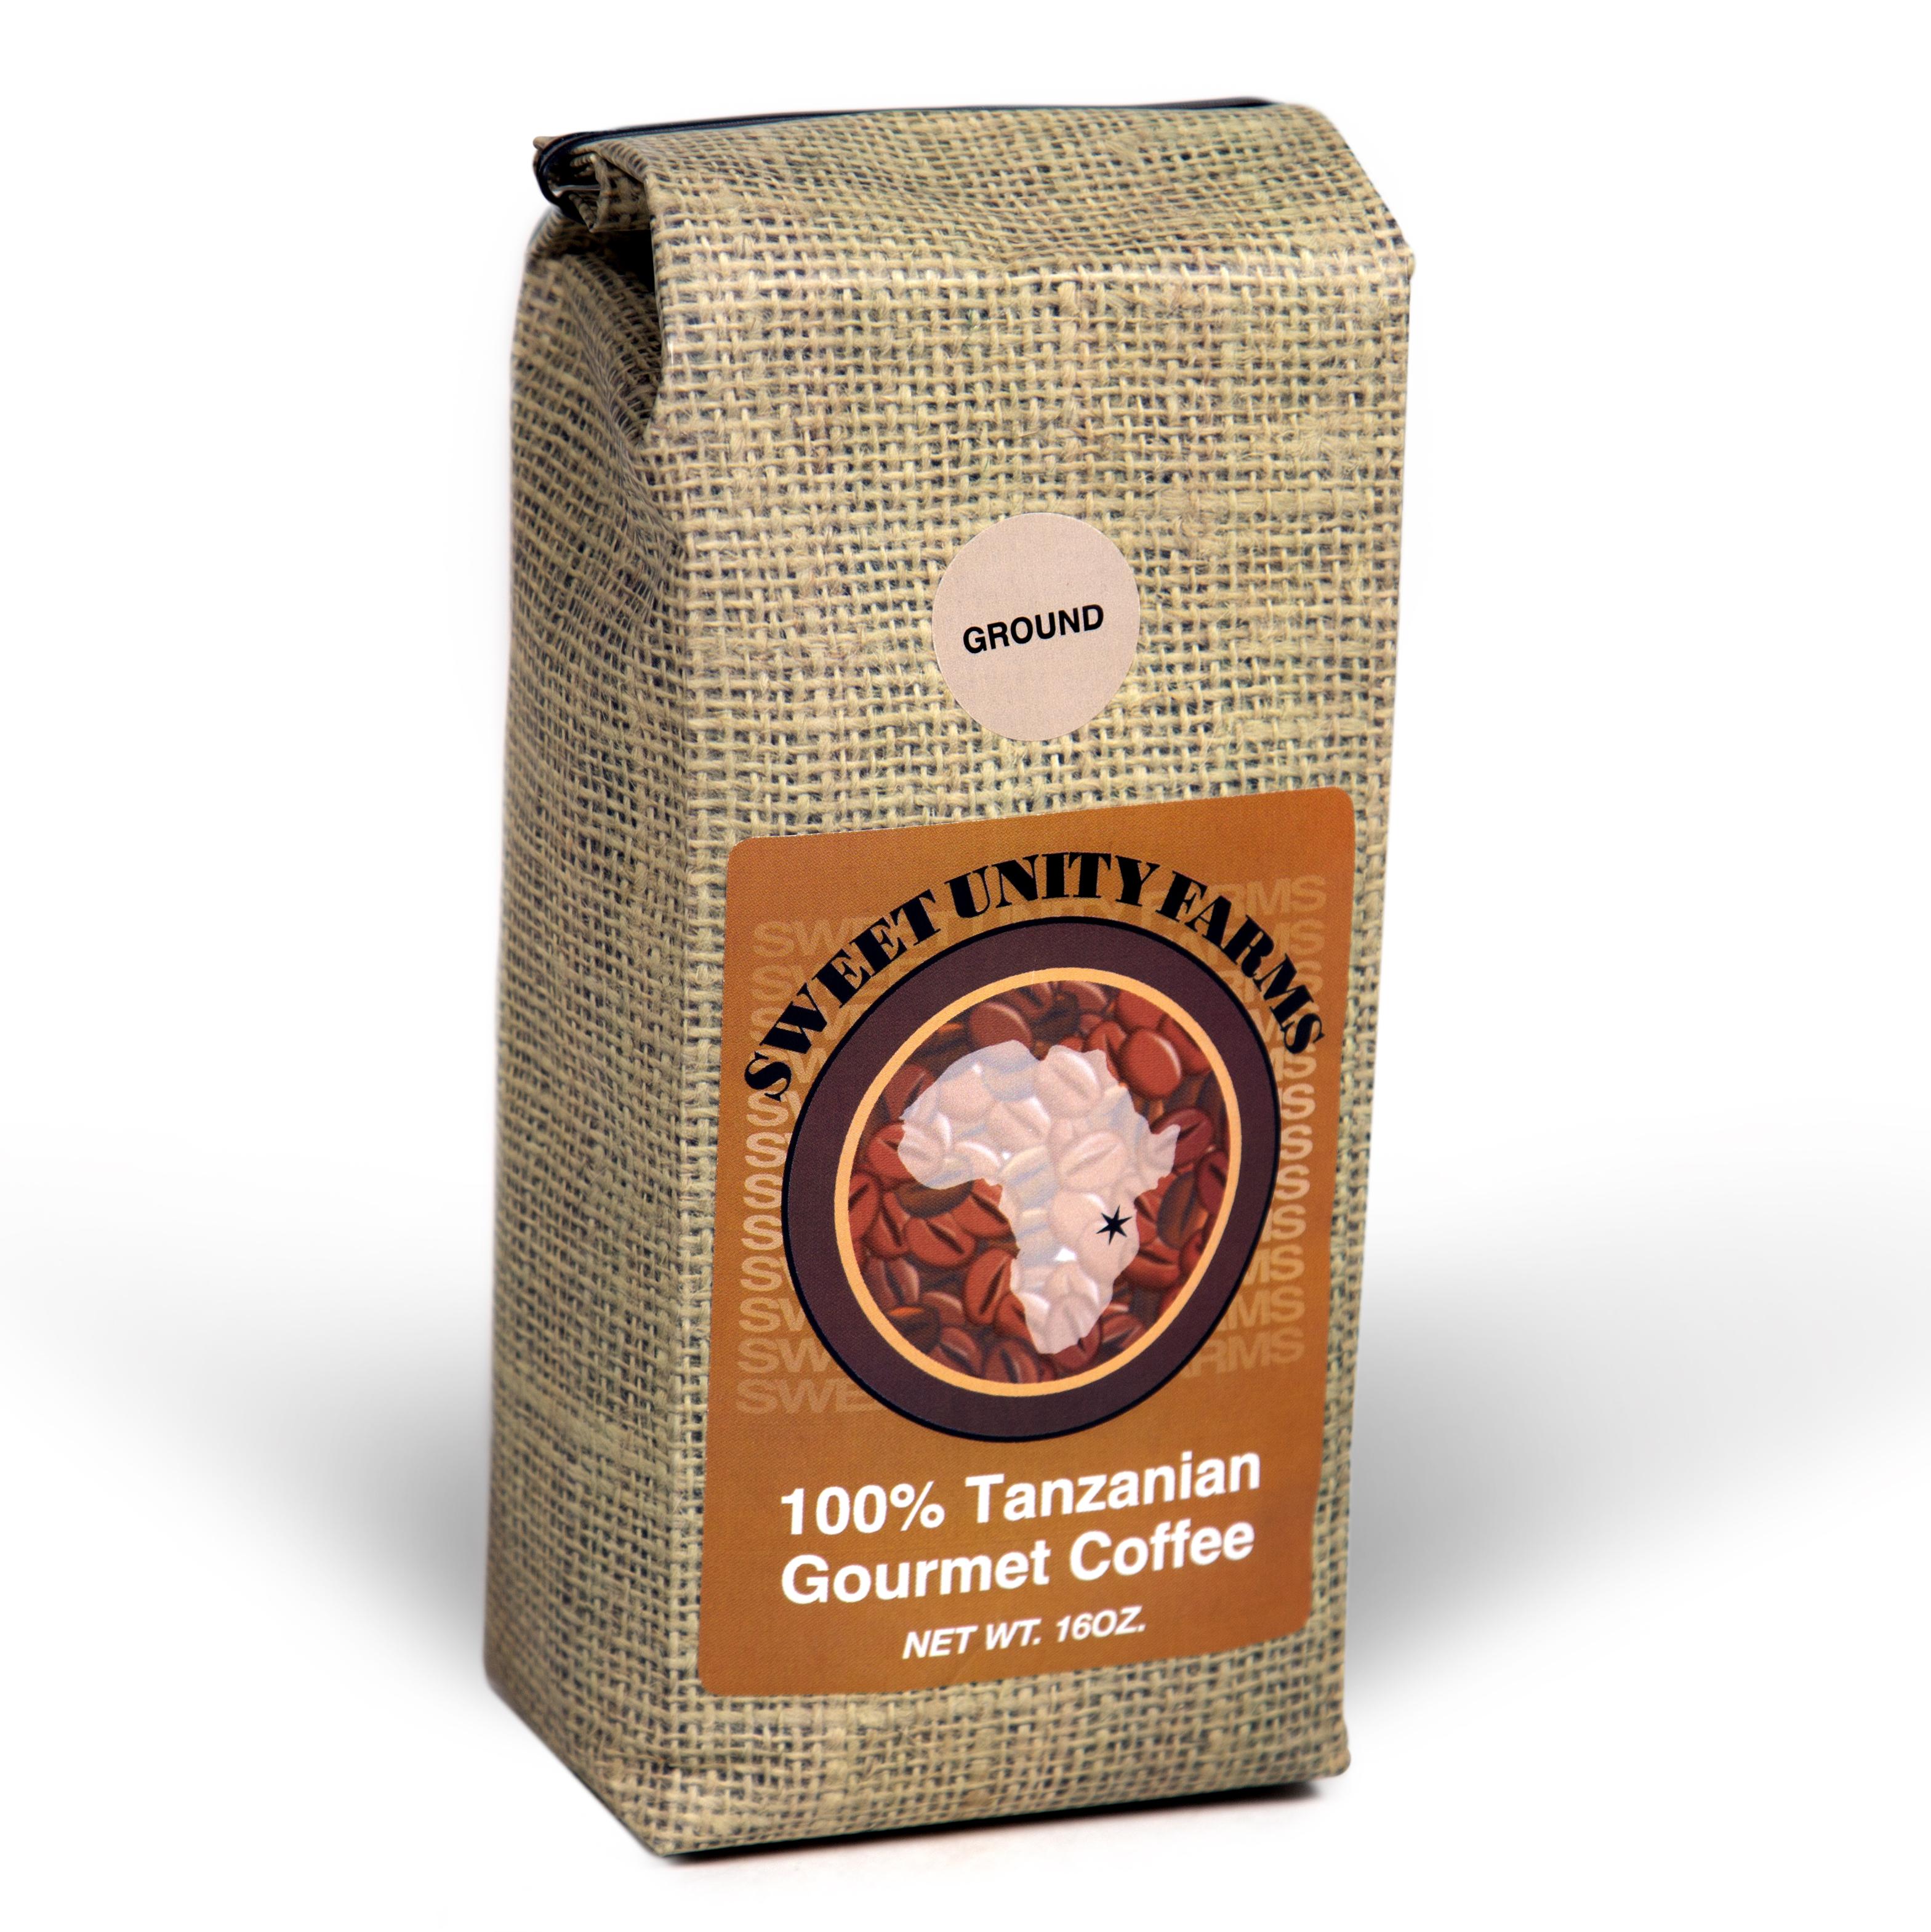 Sweet Unity Farms Coffee